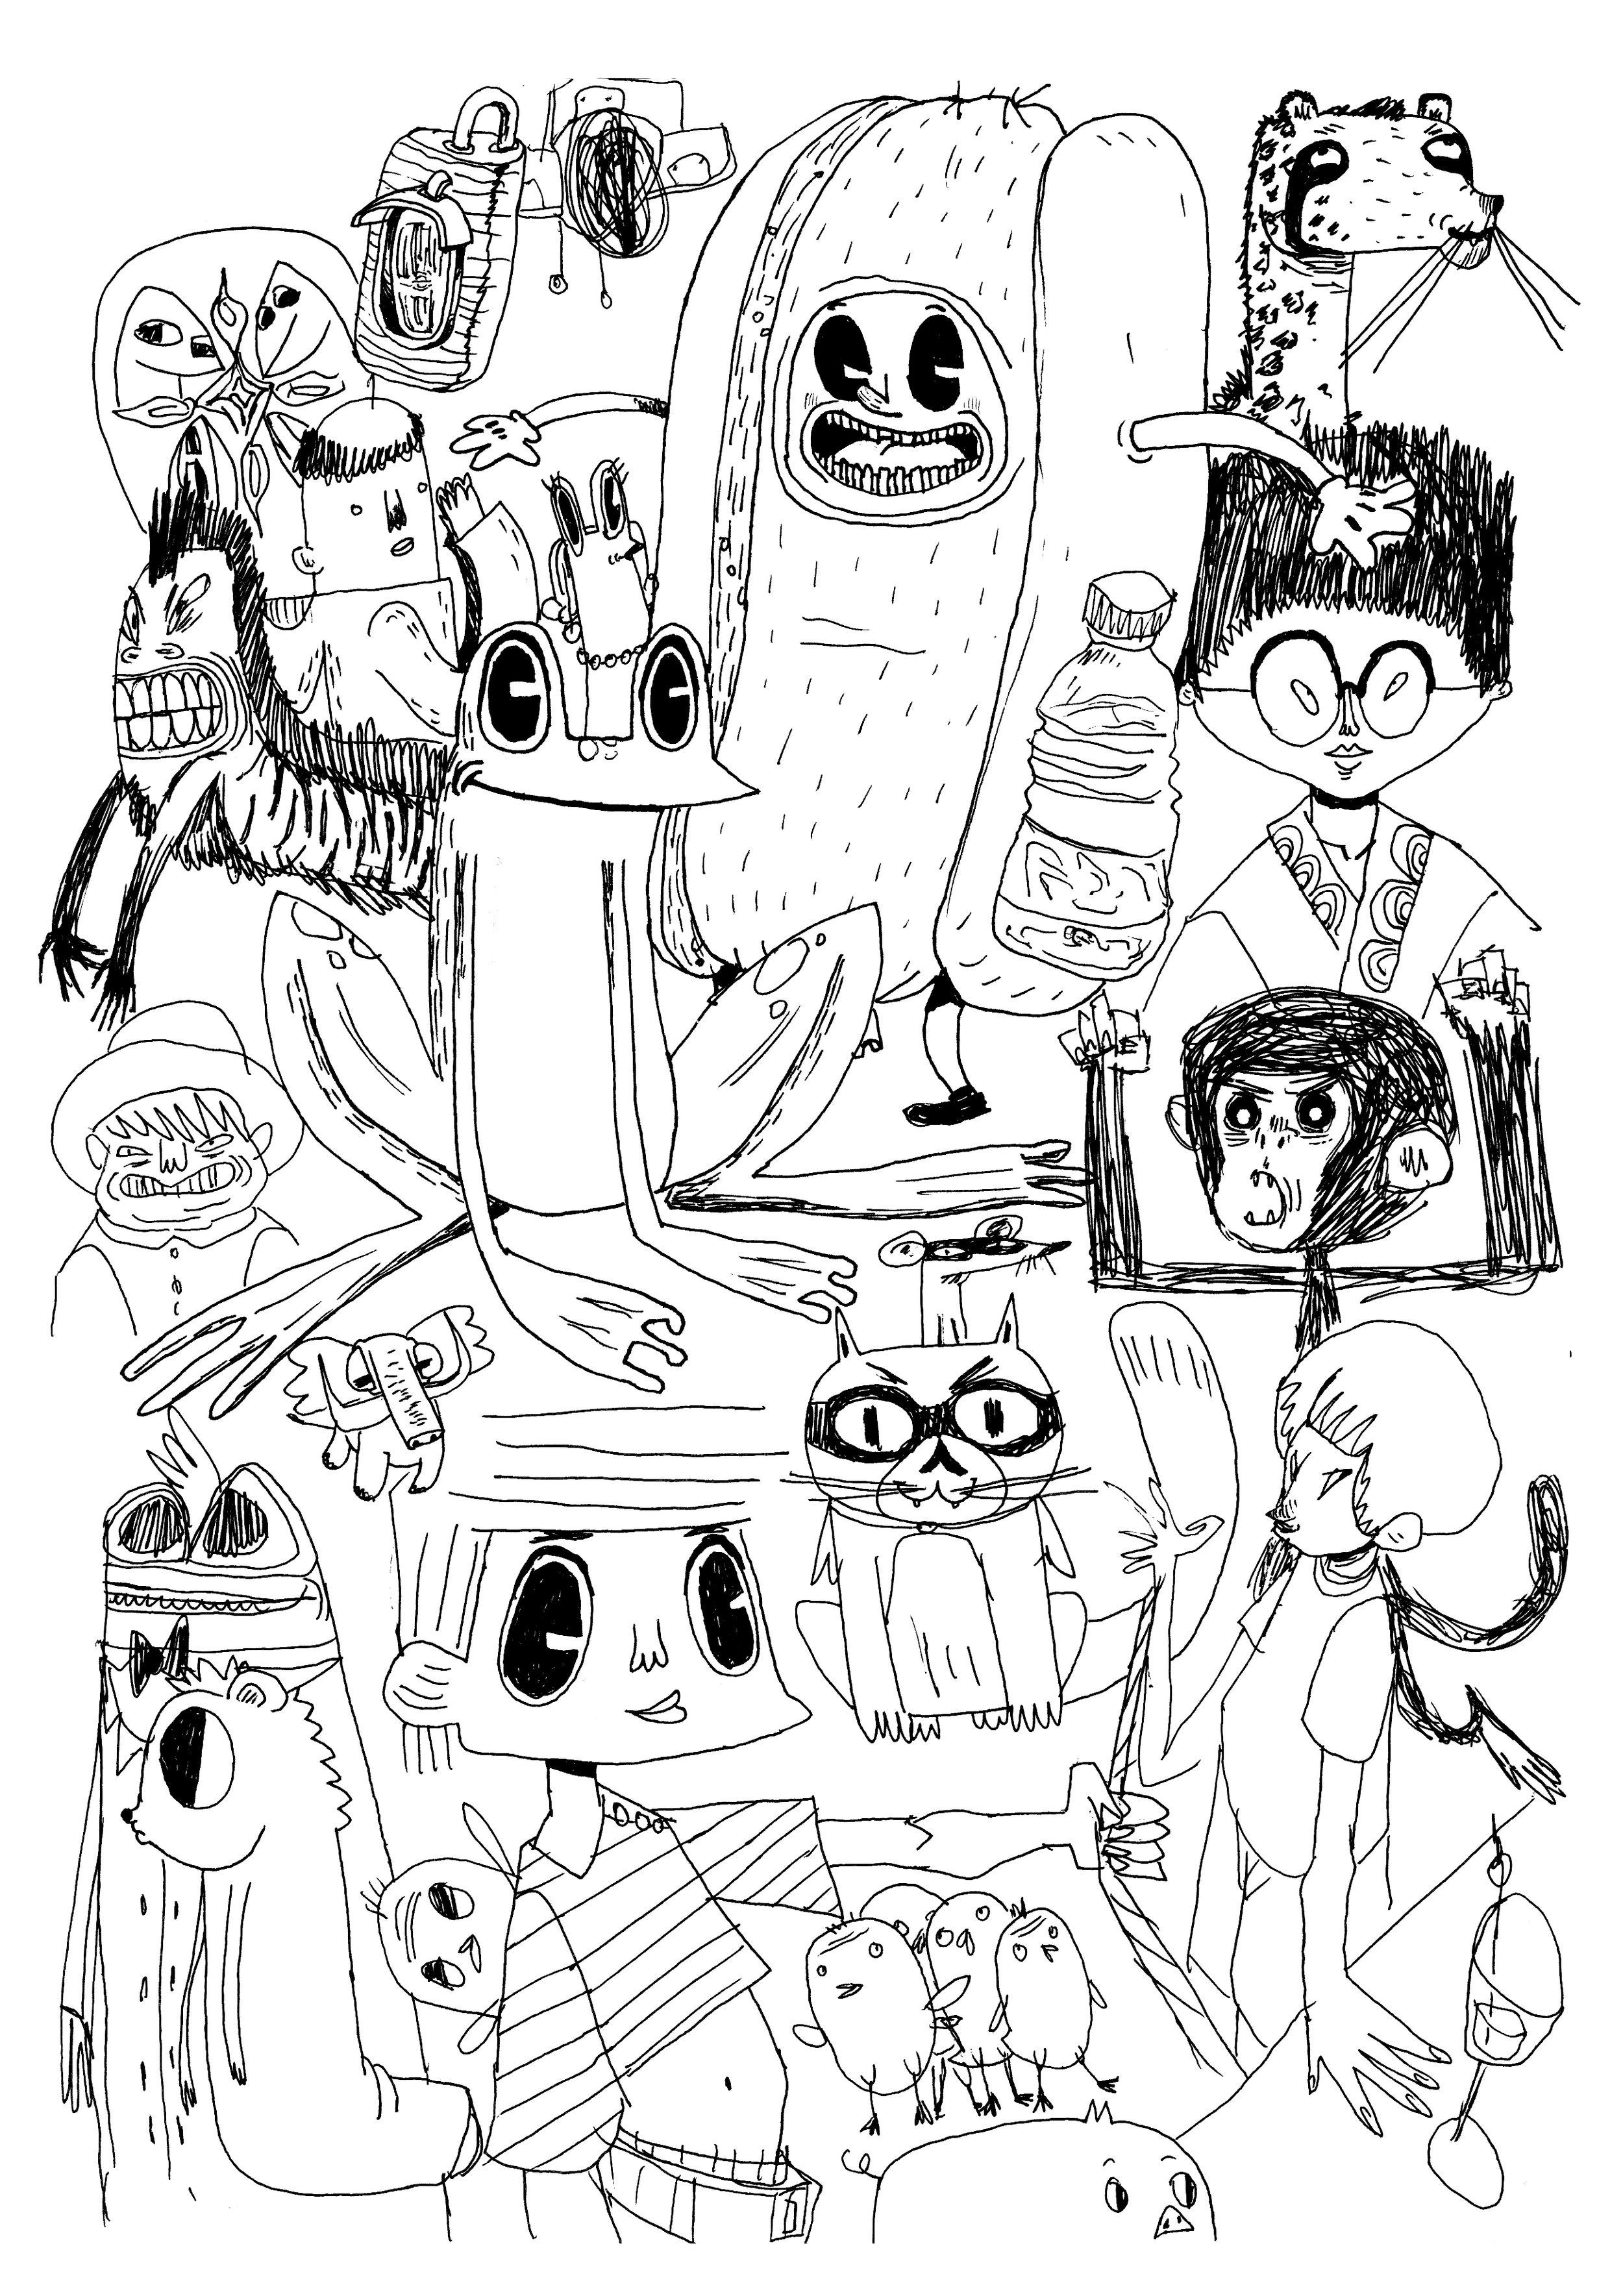 Pascal_Zaffiro_Doodle_5.jpg